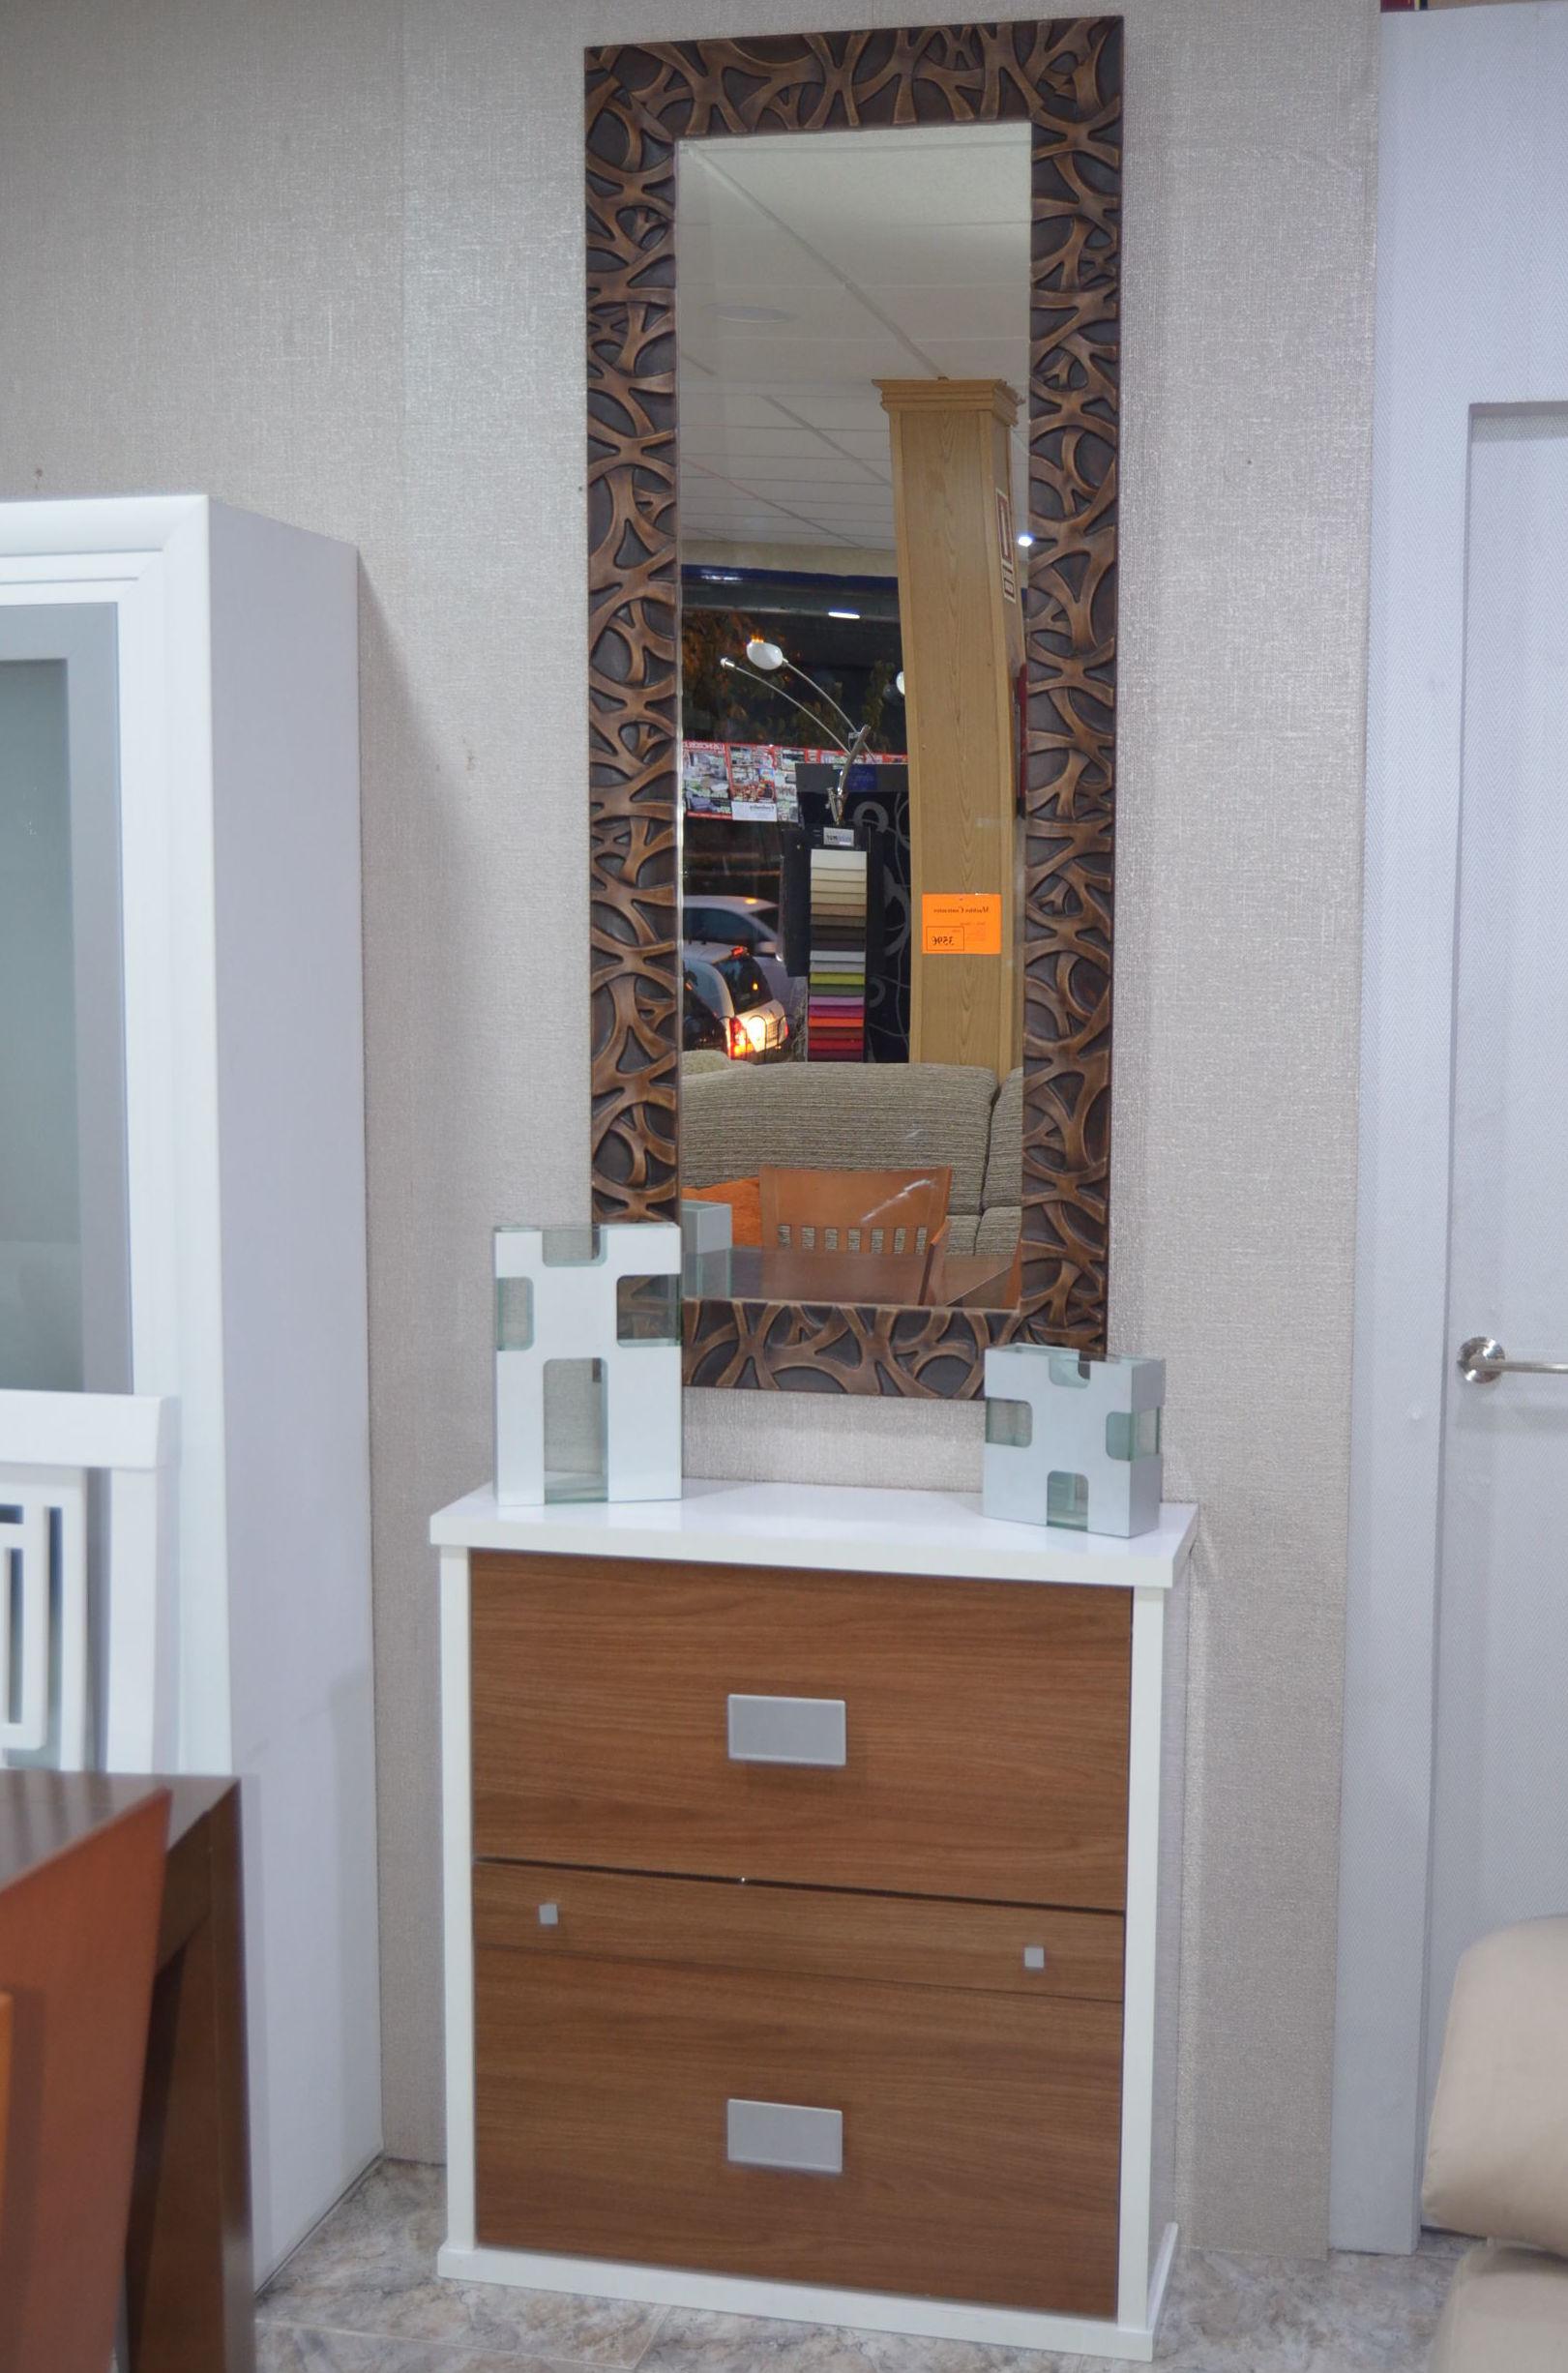 Muebles baratos en Leganés